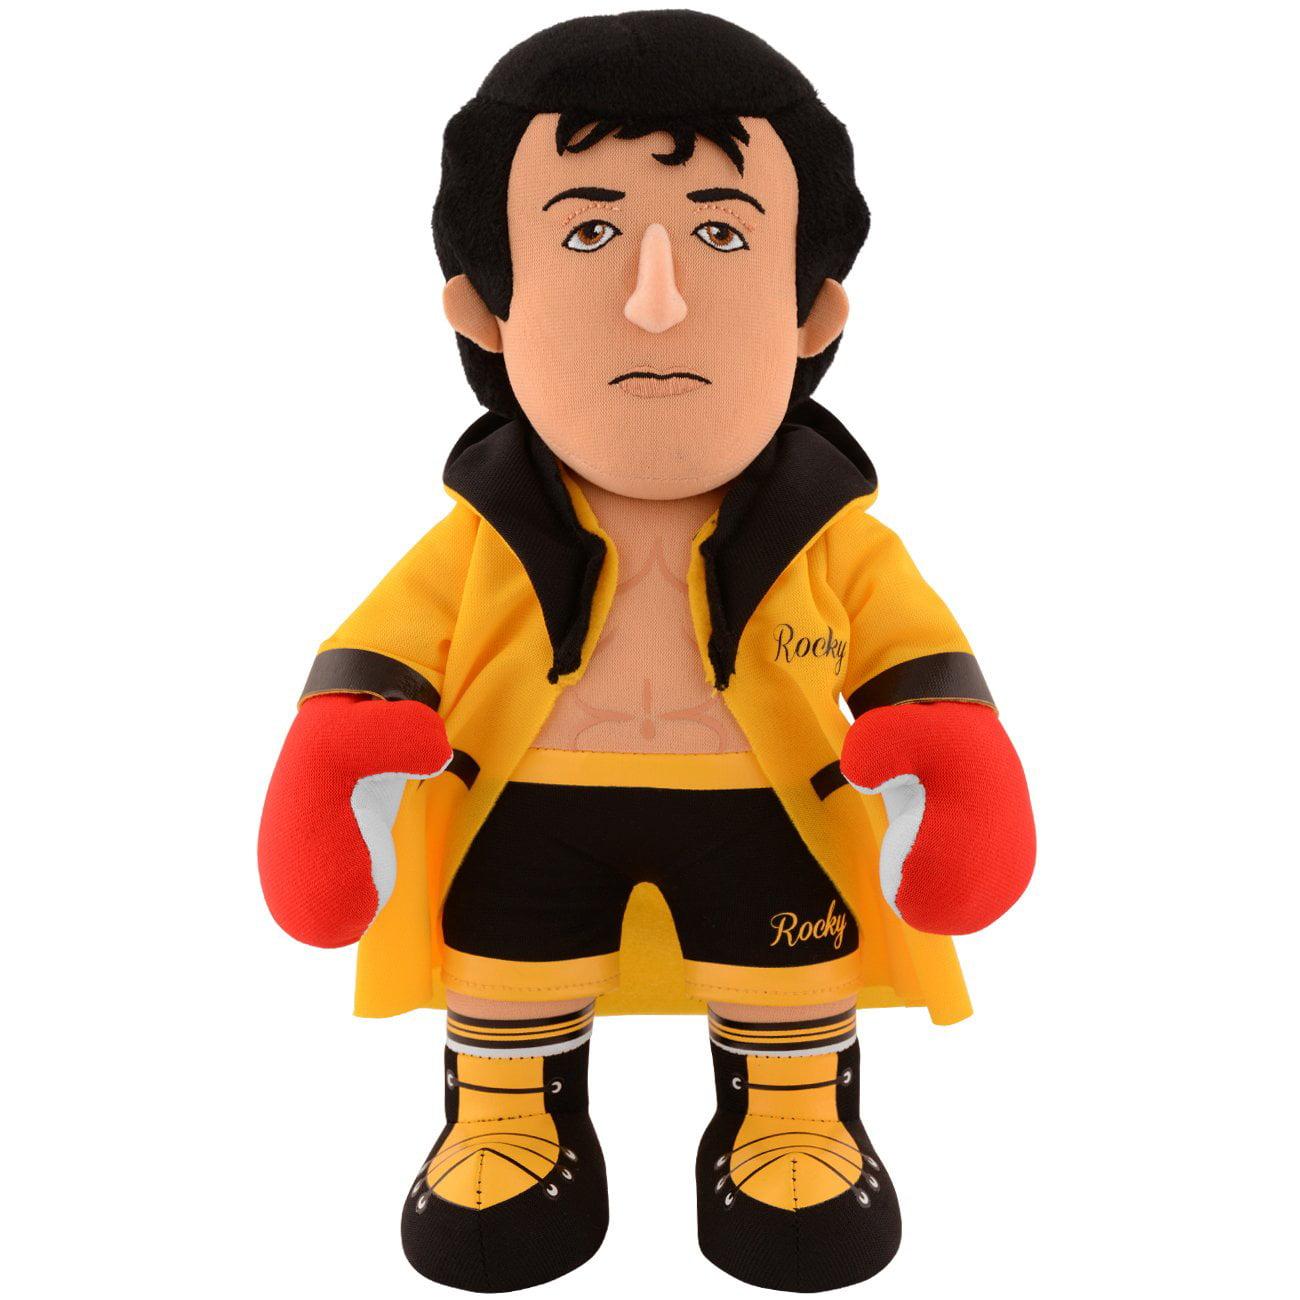 "Rocky Balboa in Boxing Robe 10"" Plush Figure"